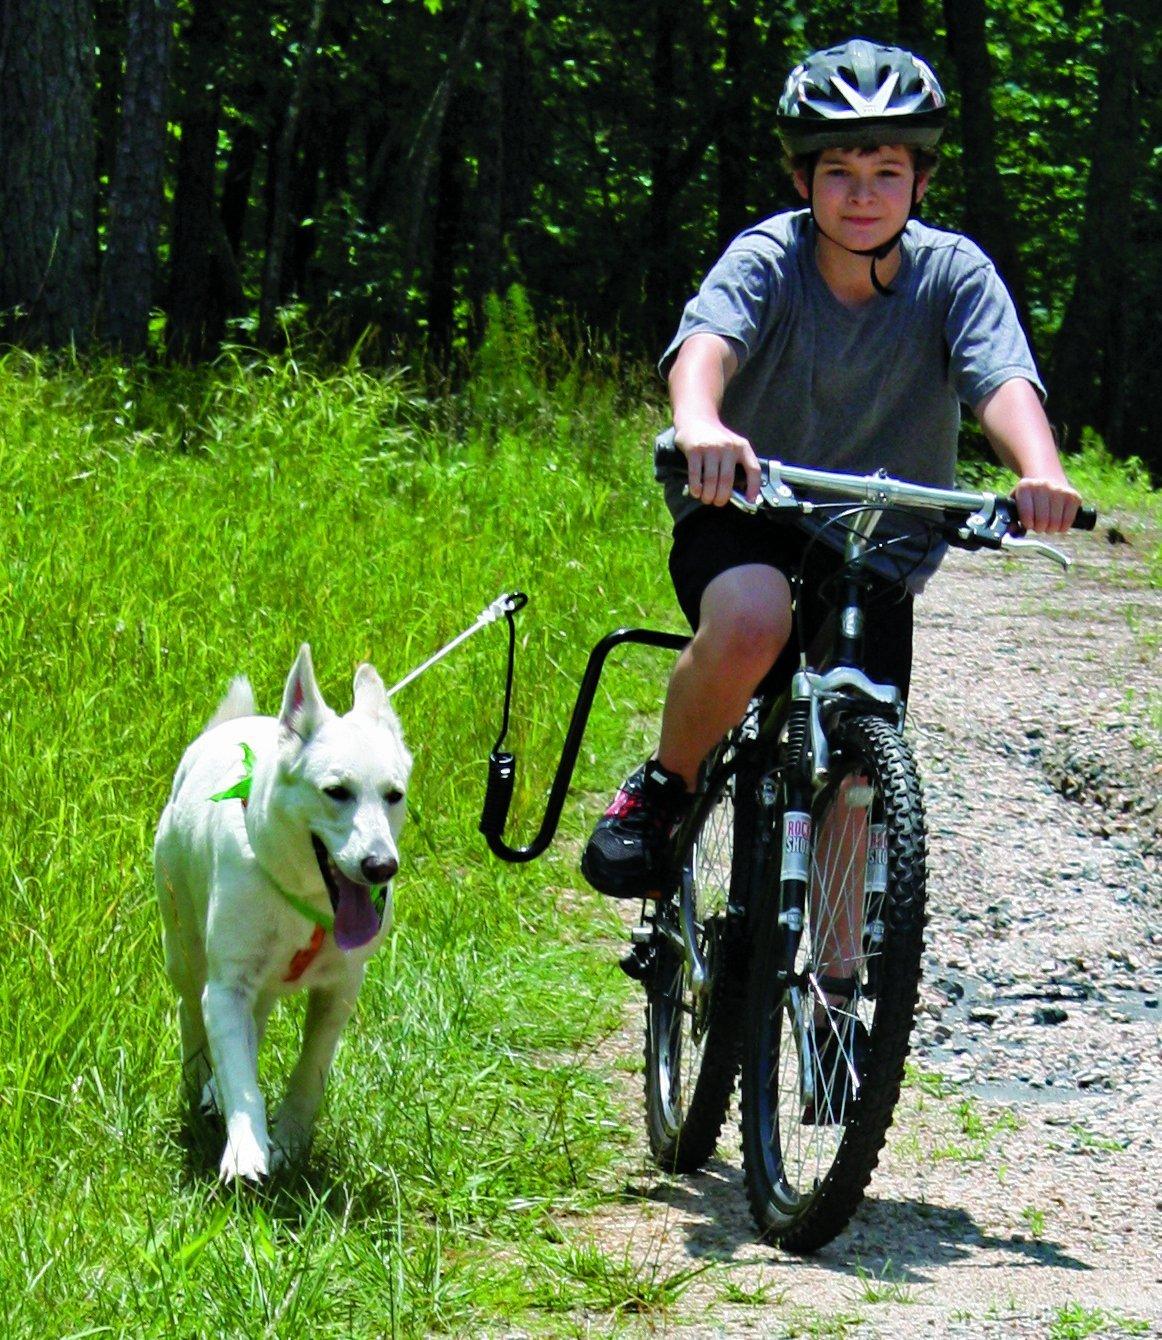 Safely Biking With Your Dog with Springer Dog Exerciser